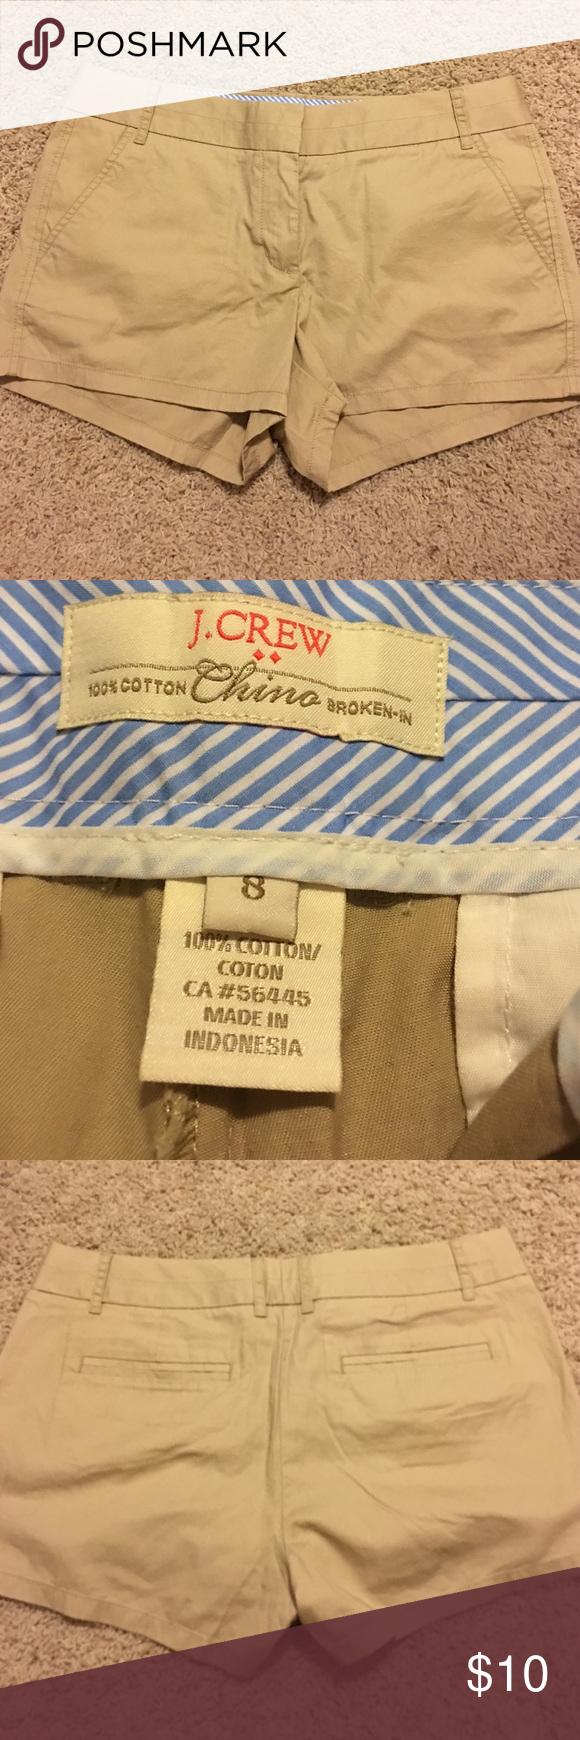 J crew shorts NWOT. Never worn. J. Crew Shorts